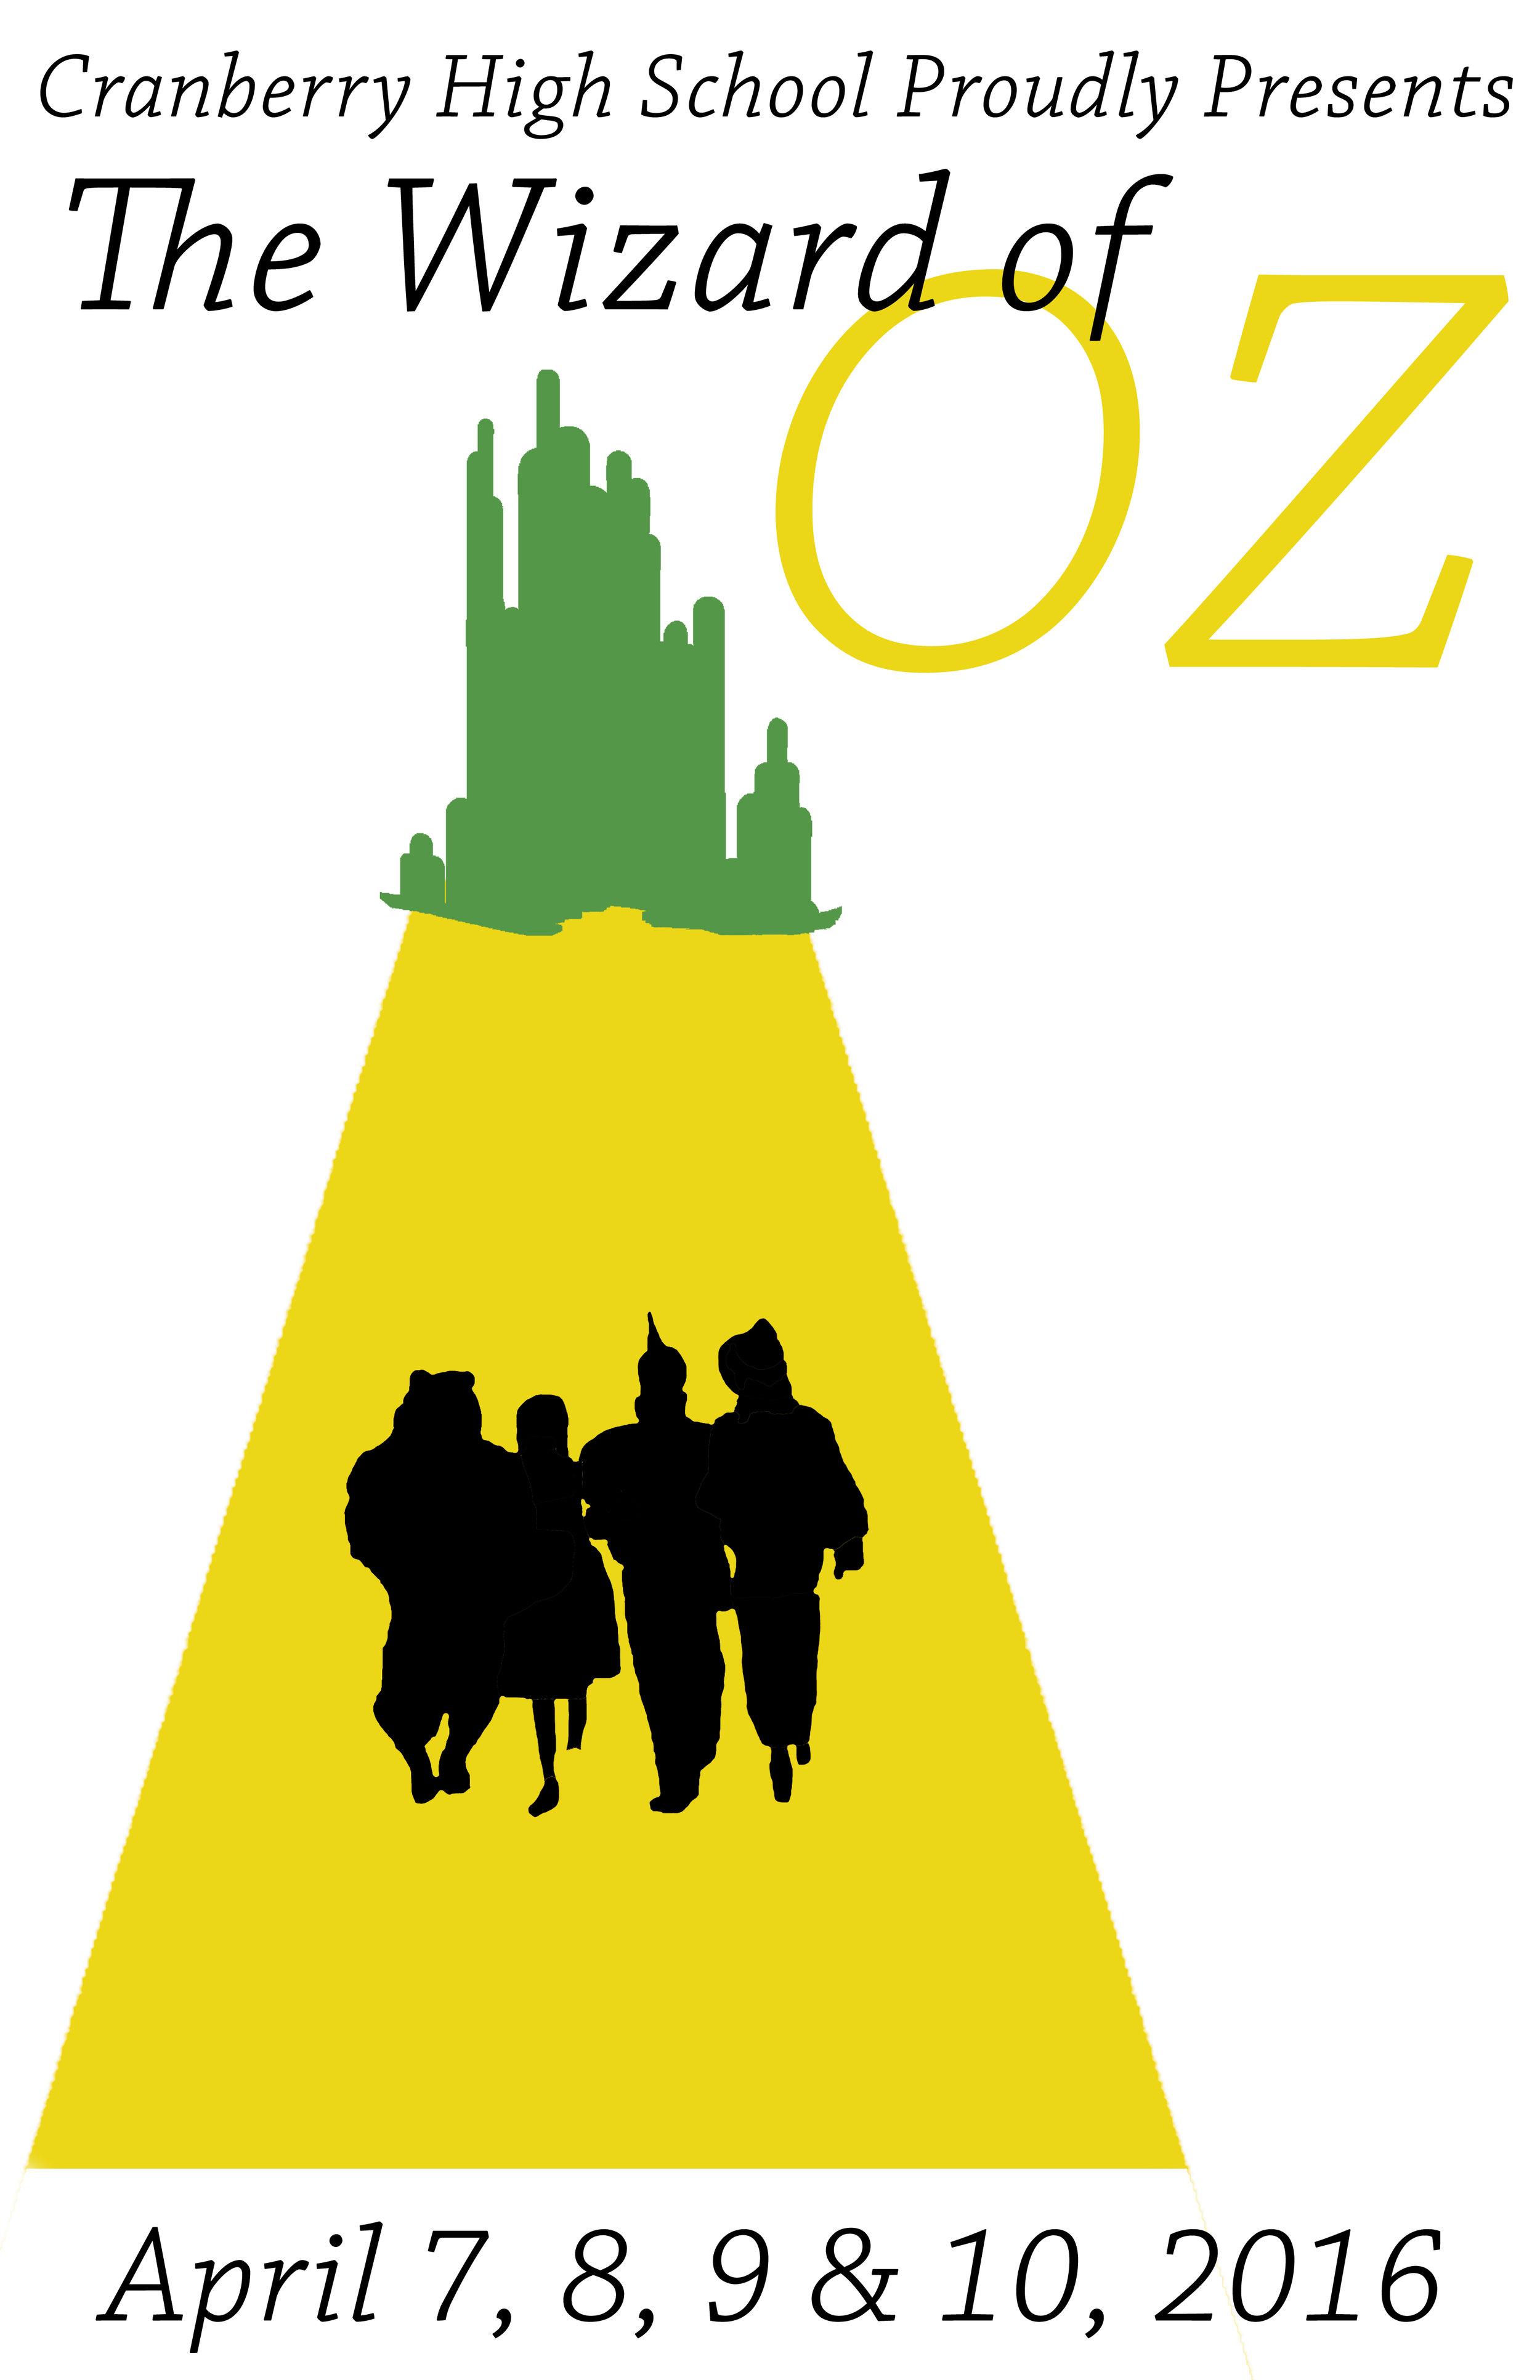 WizardOfOzt-shirt.jpg